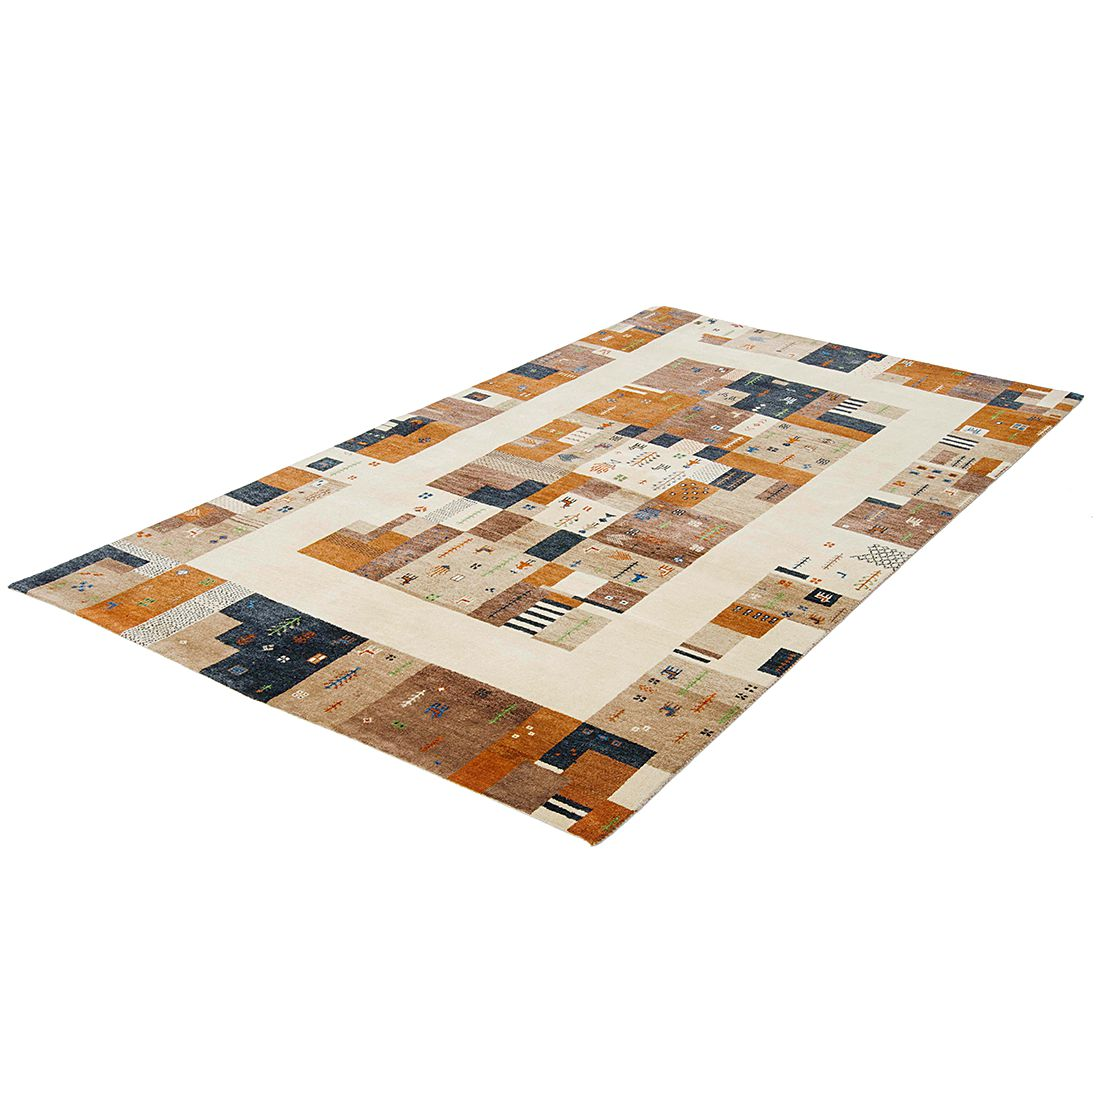 Teppich Zamora Gabbeh - Camel - Maße: 240 x 170 cm, Parwis